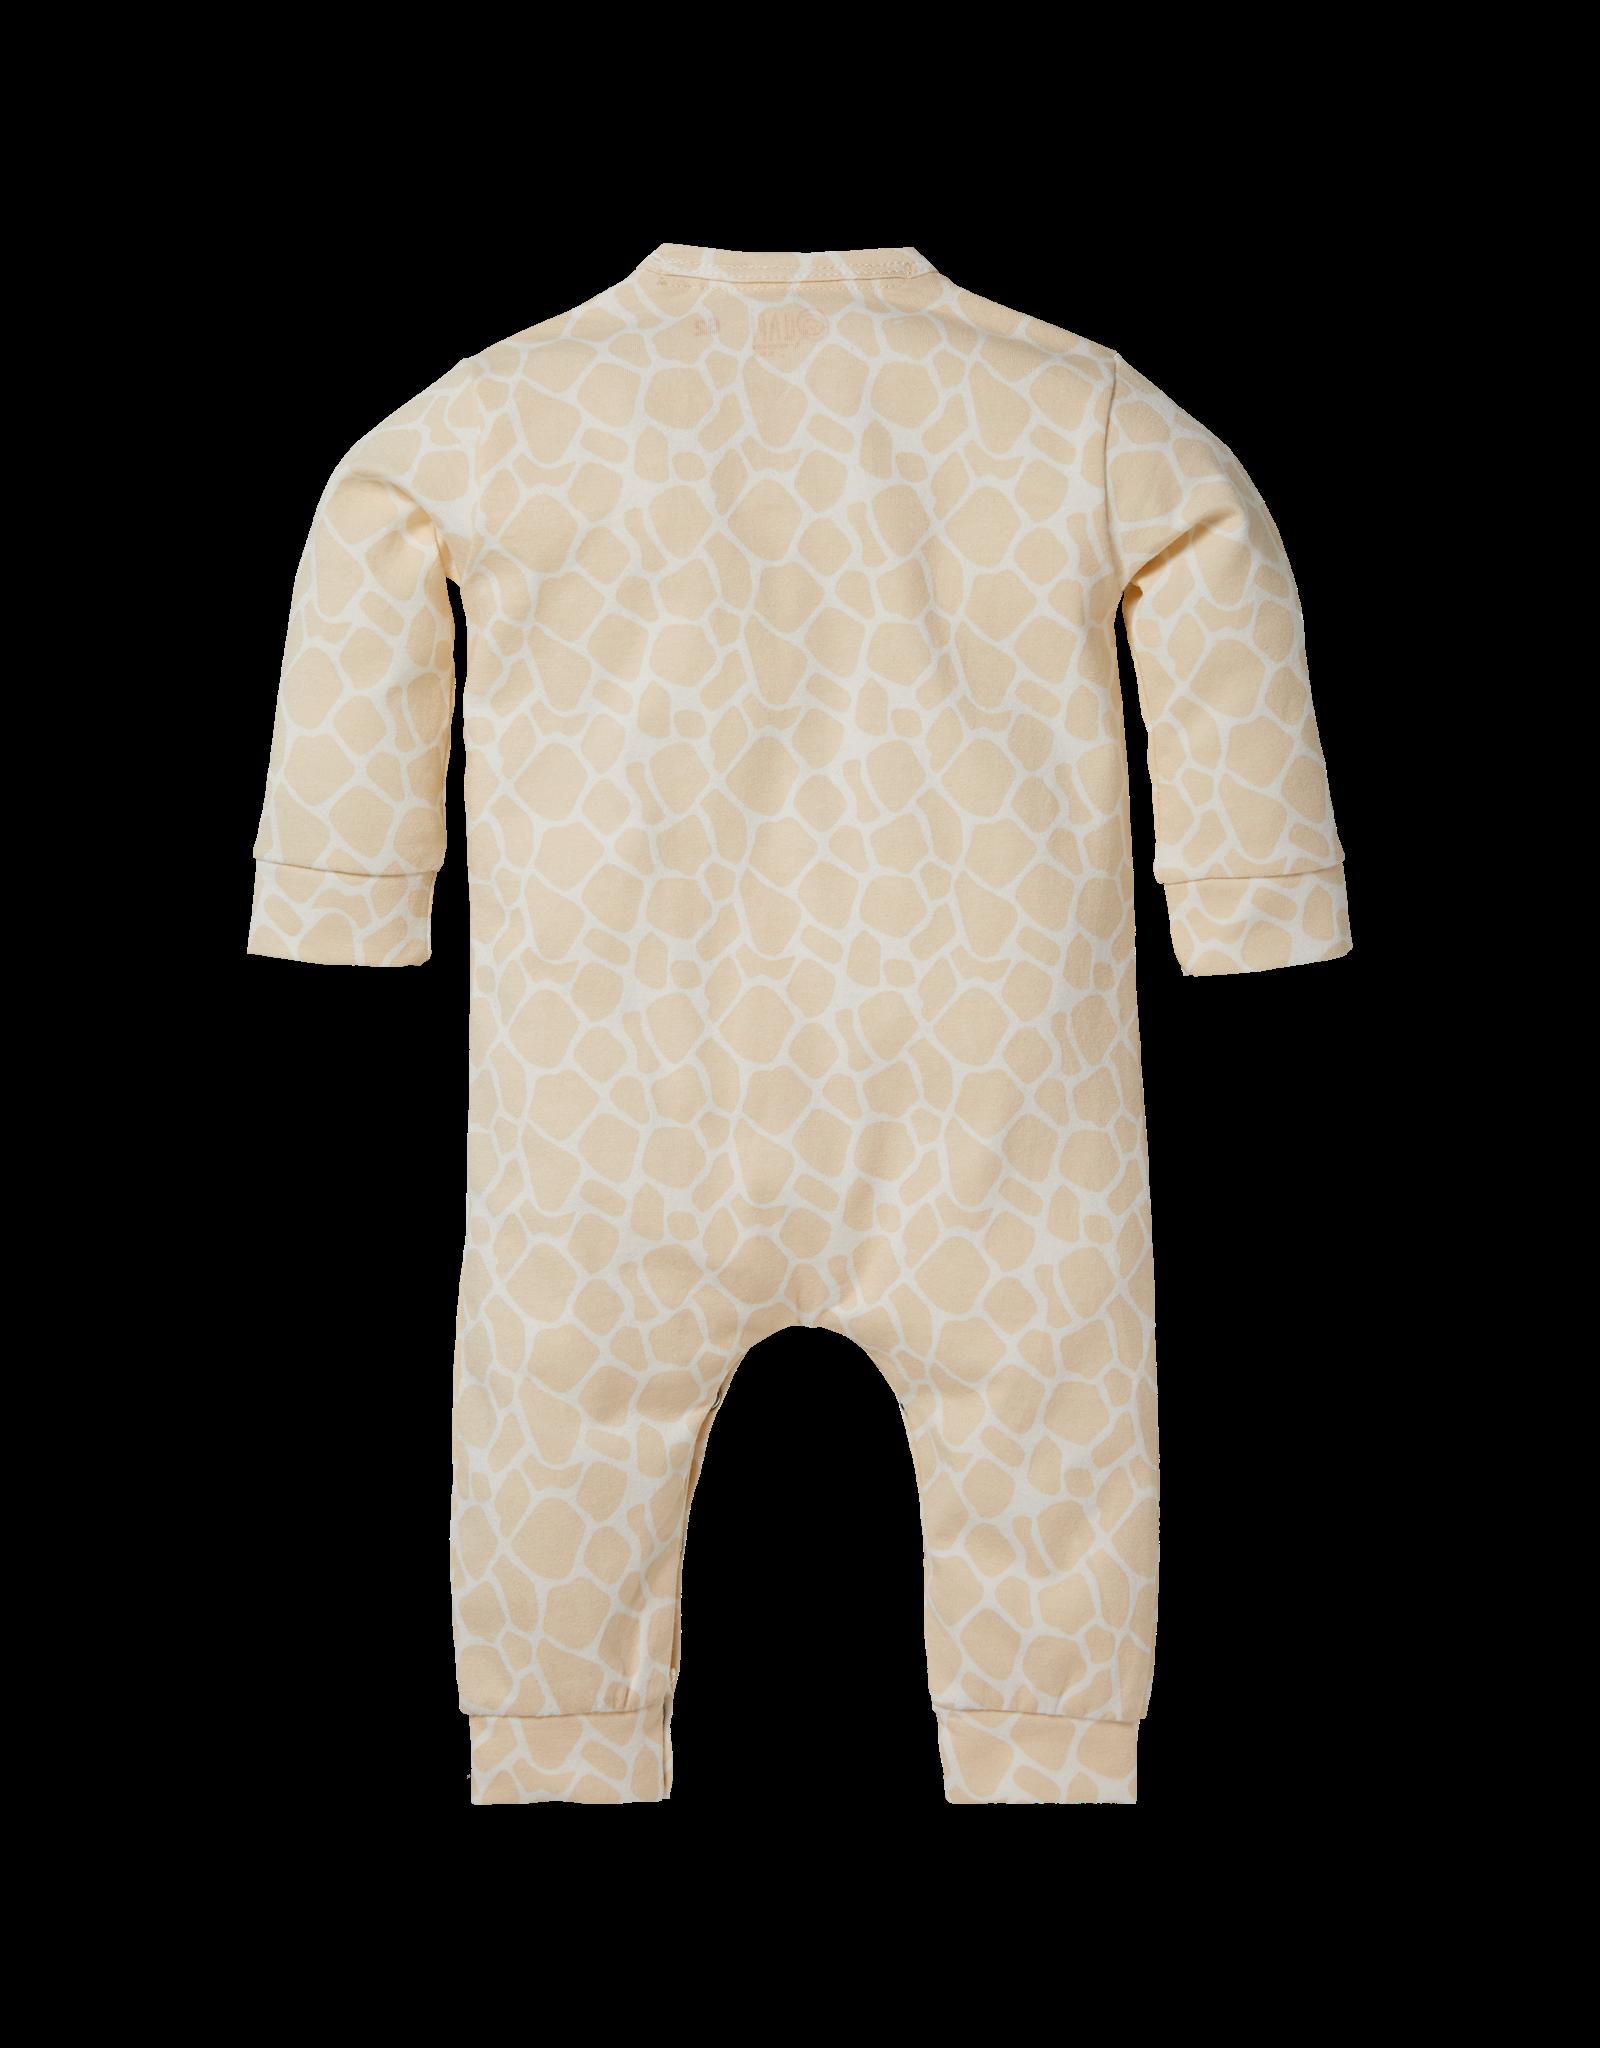 Quapi PLAYSUIT, NIKKI , Sand Giraffe